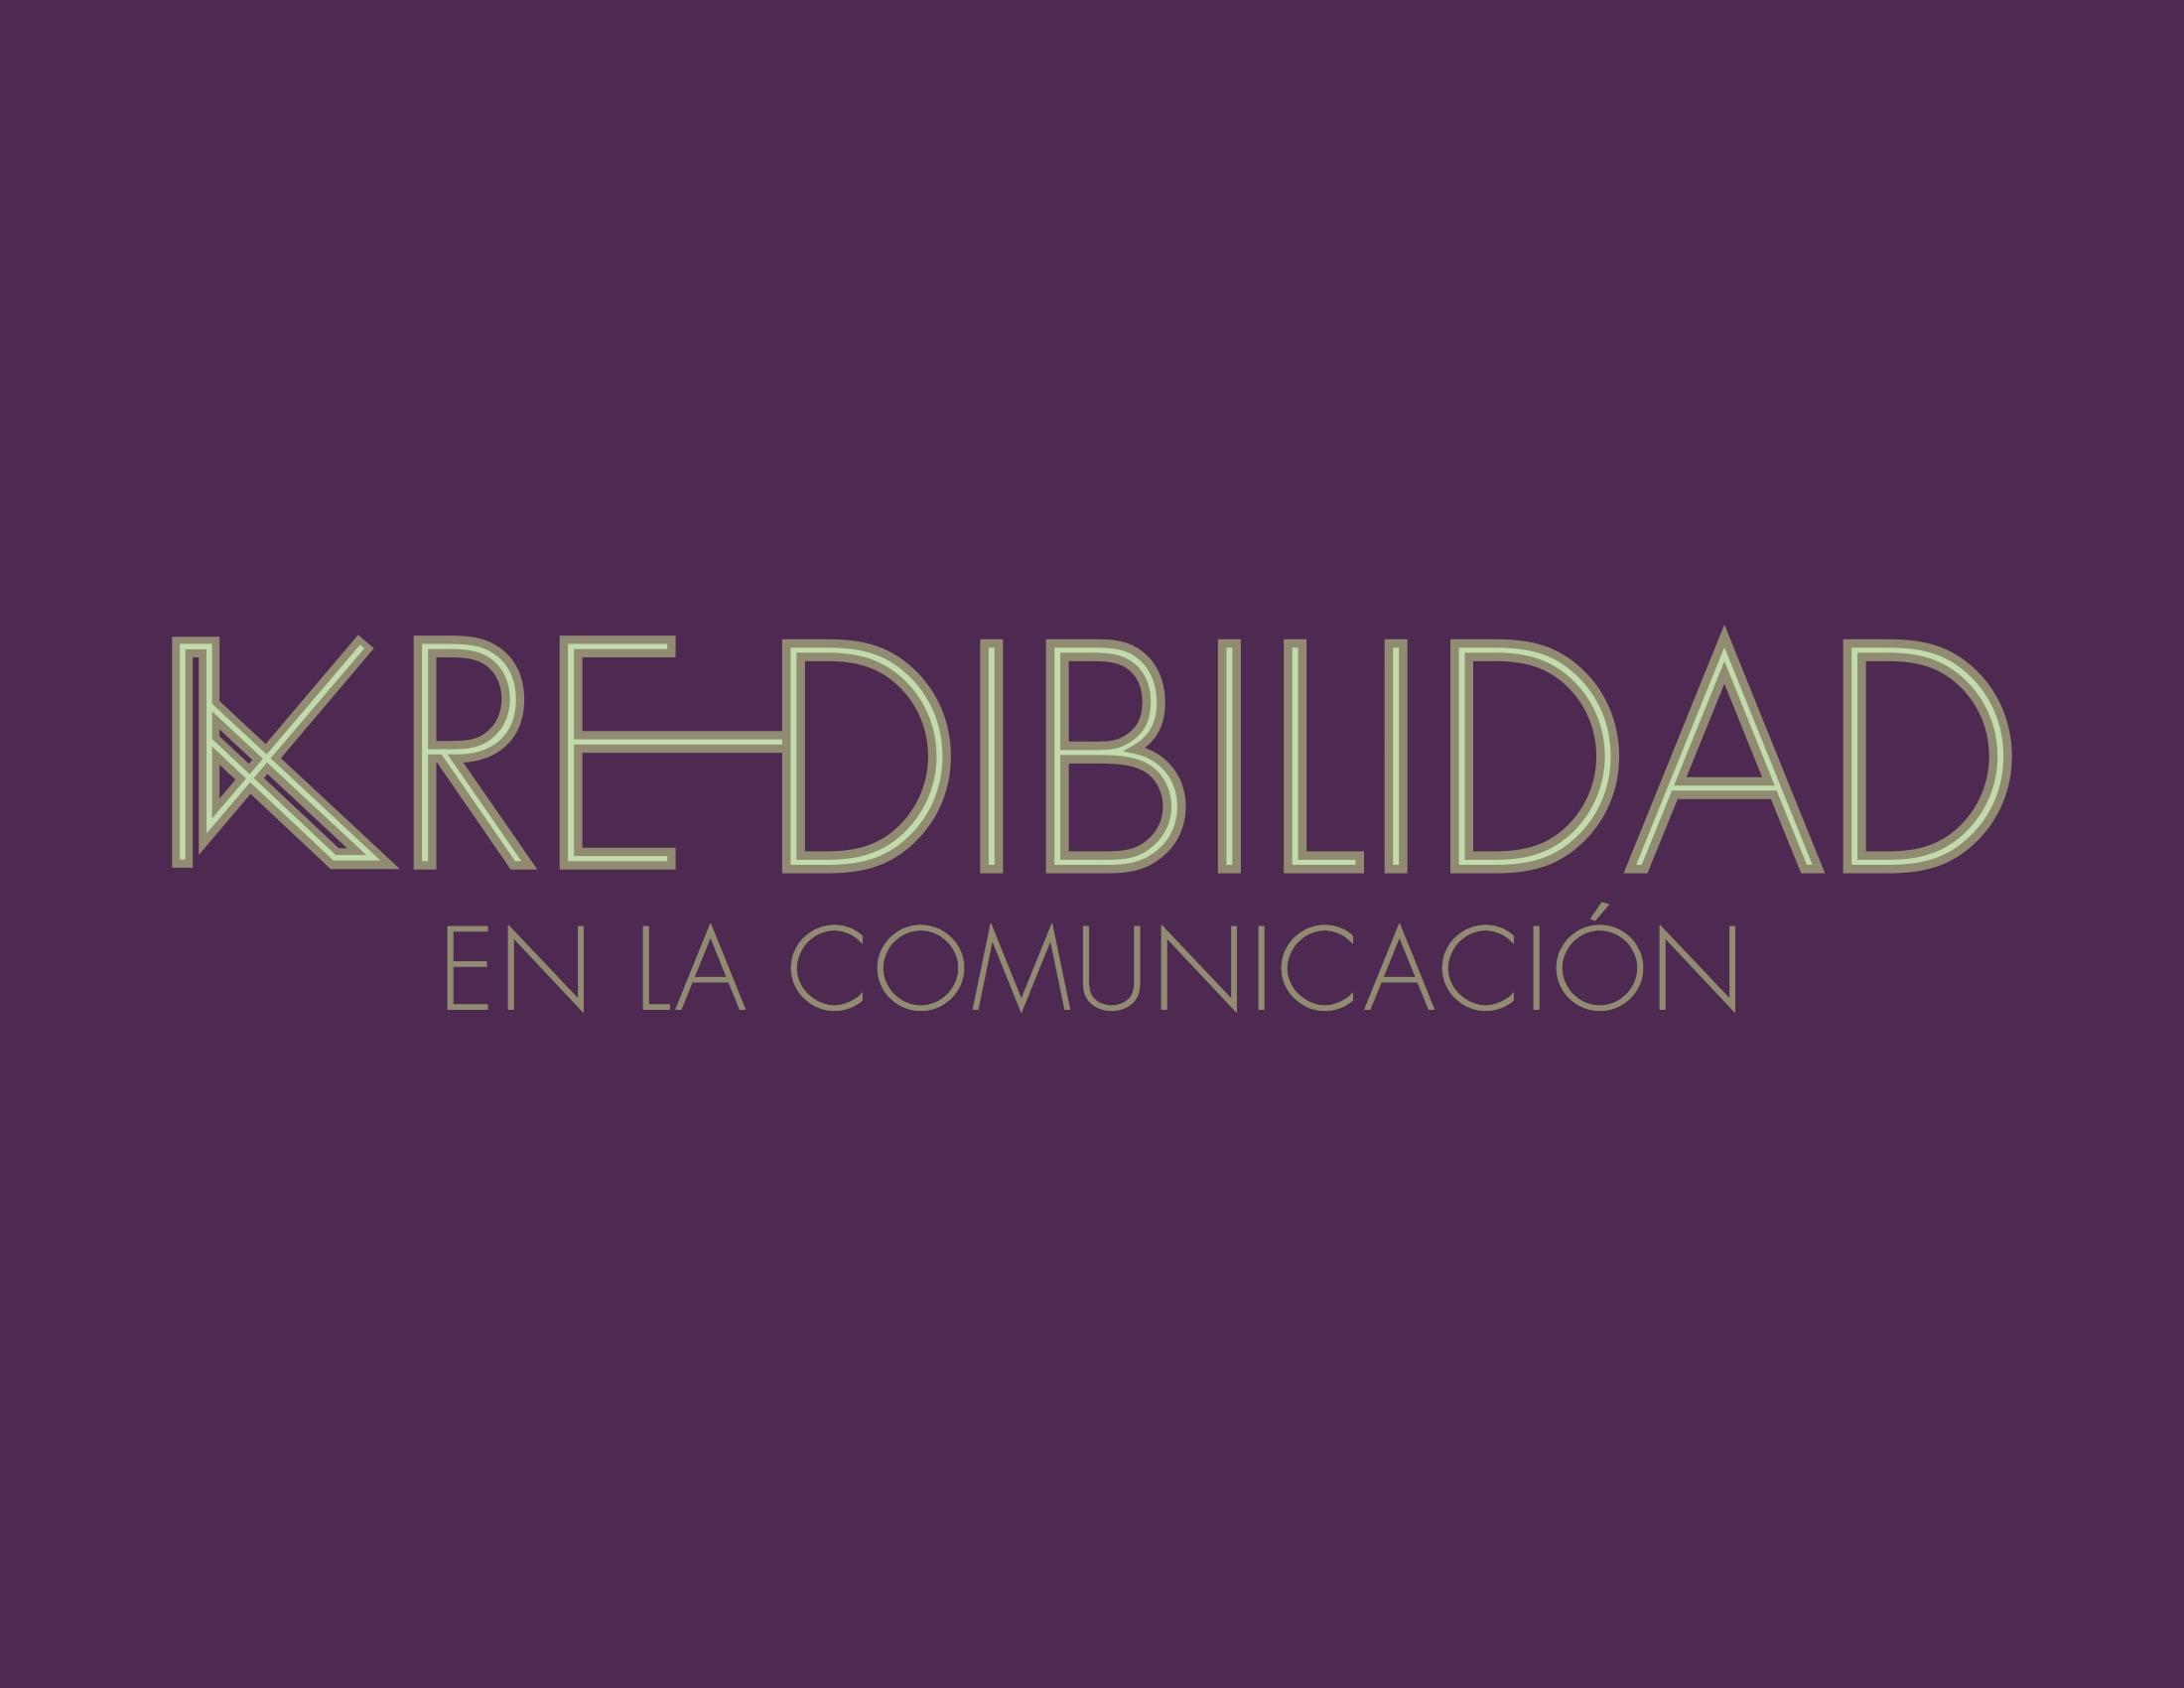 KREO_PRESENTACION12.jpg